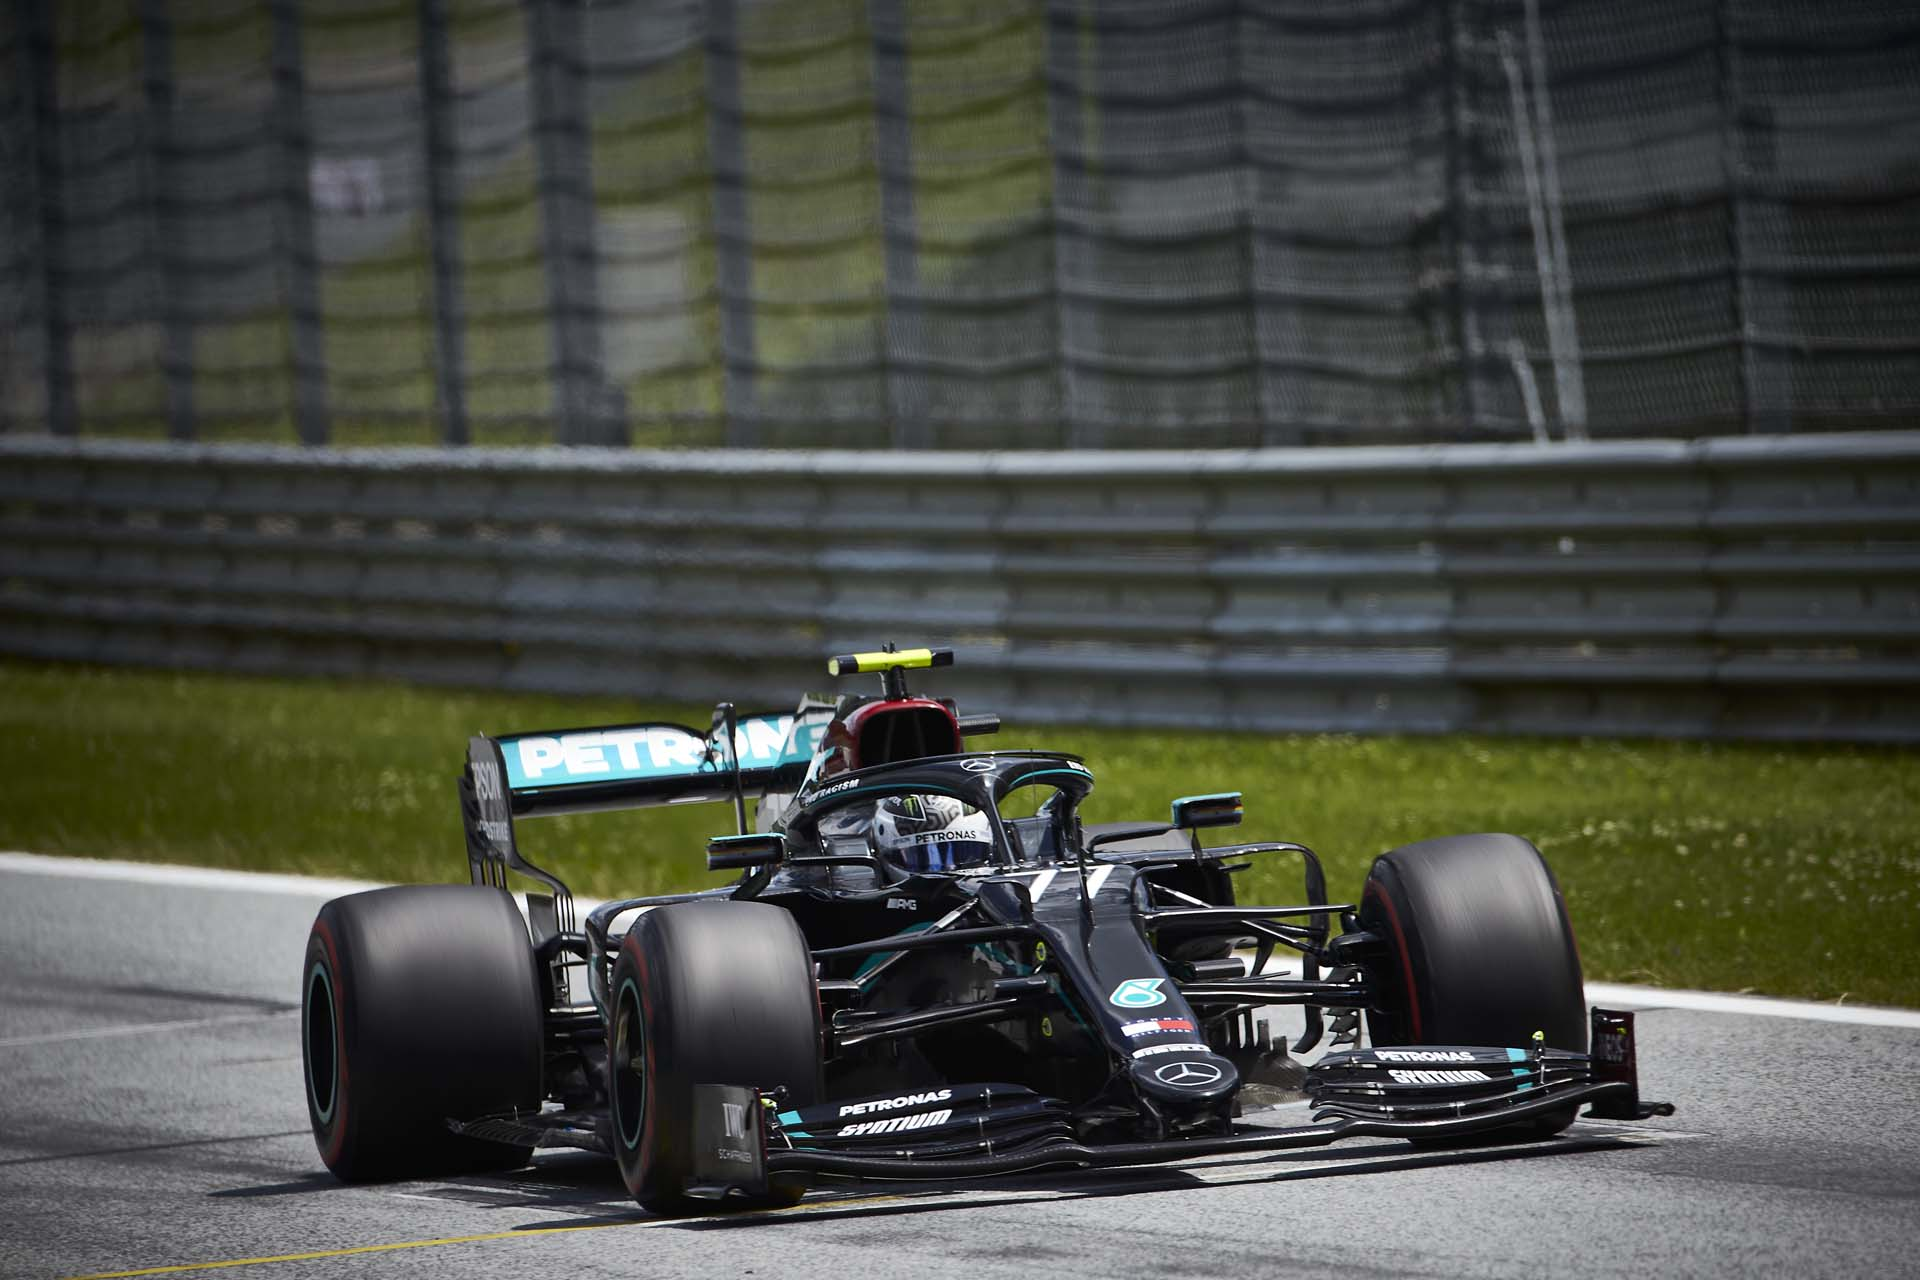 2020 Austrian Grand Prix, Saturday - Steve Etherington